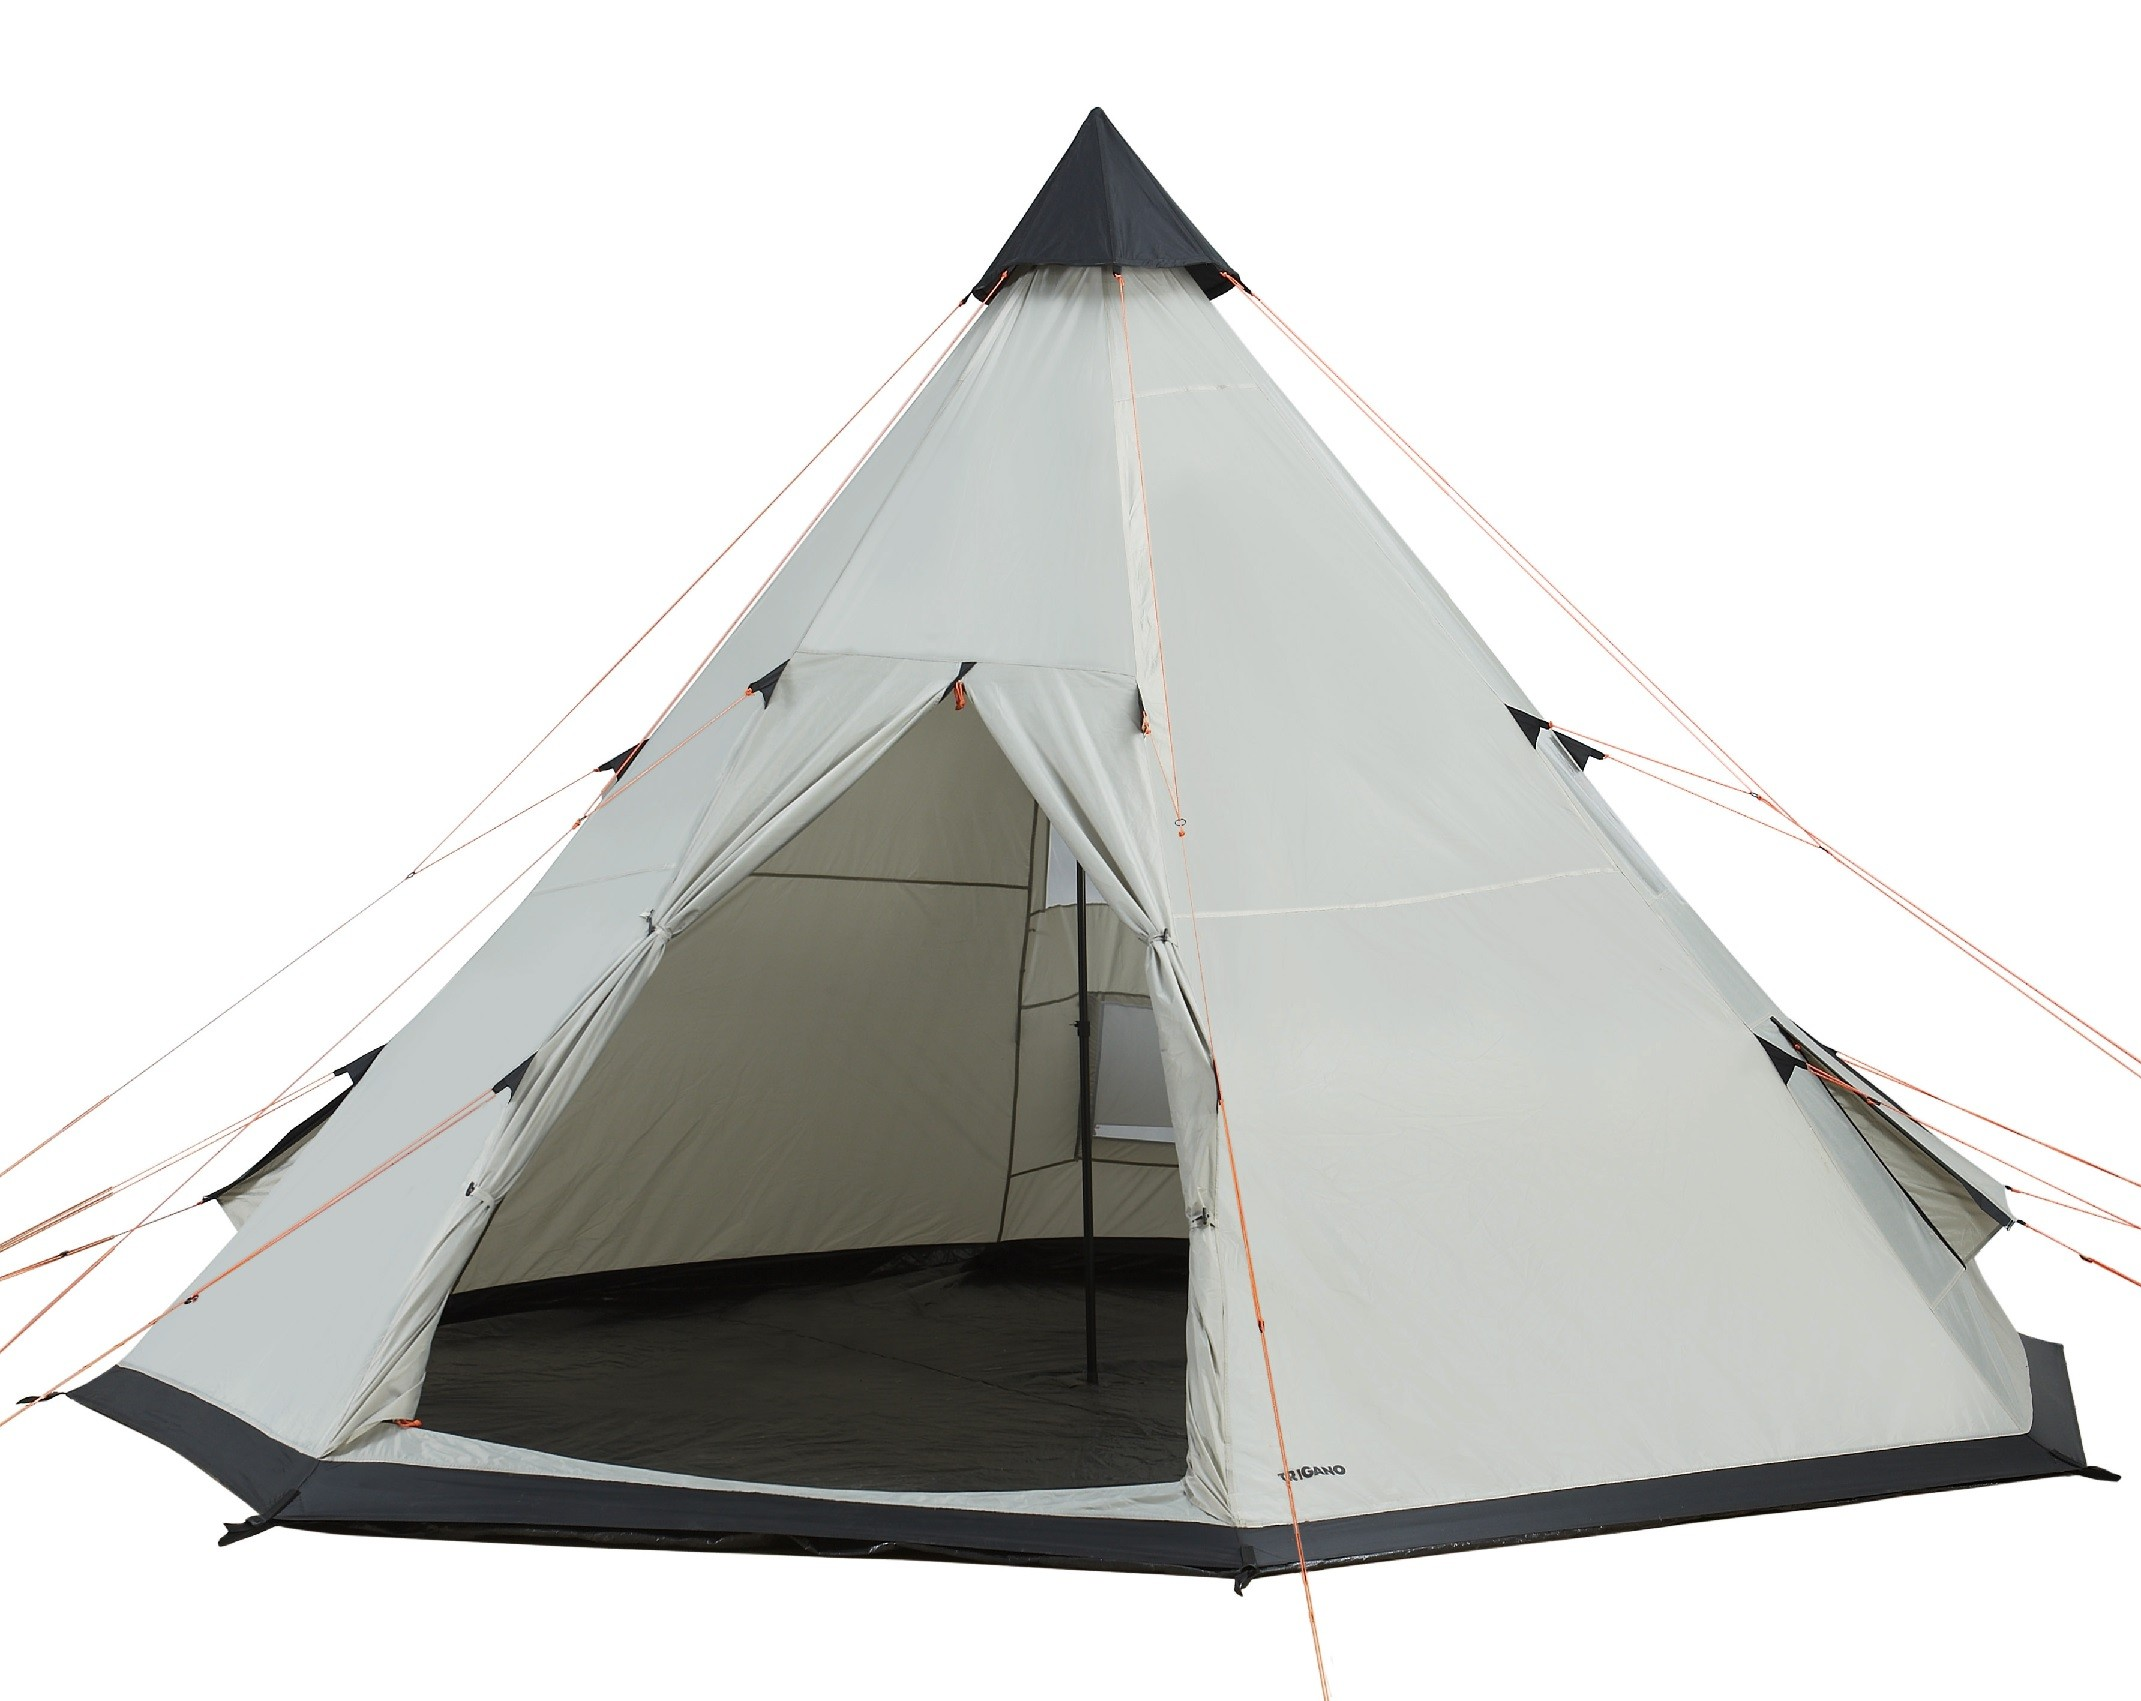 sc 1 st  Outdoor Megastore & Trigano Cherokee 350 Tipi Tent